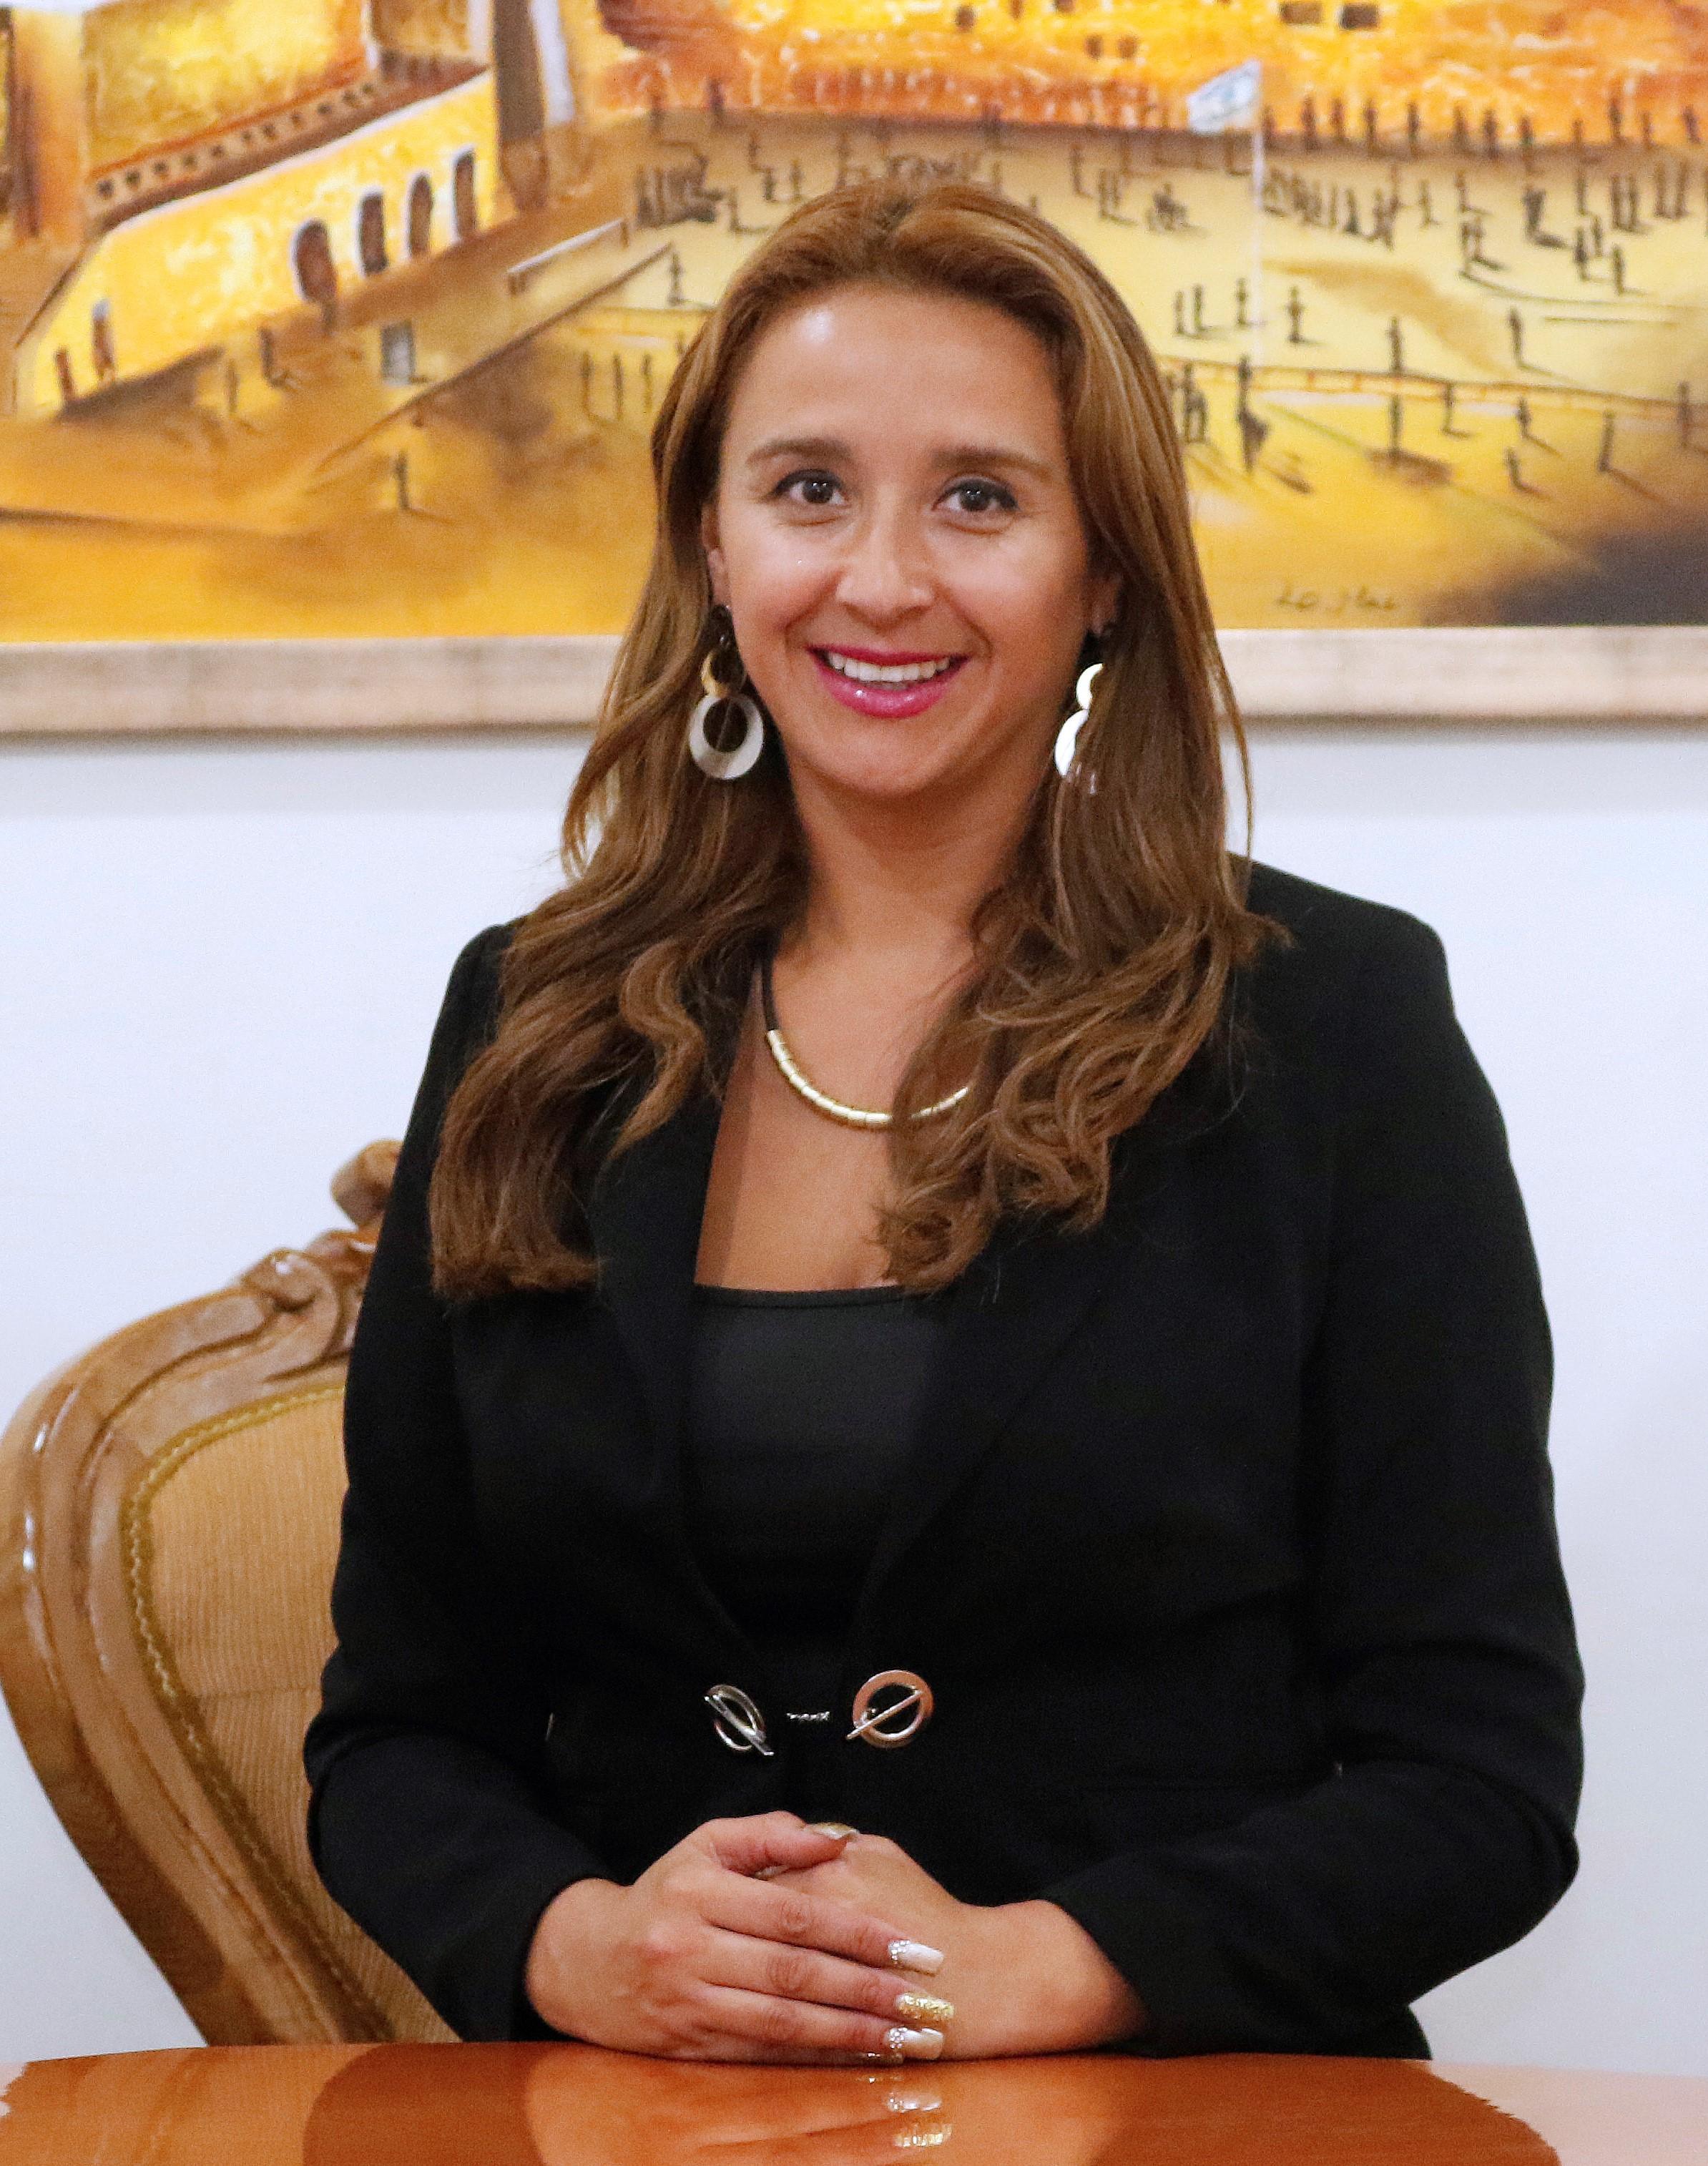 VICEPRESIDENTE Katherine Torres Machuca, Alcaldesa de Hualpen